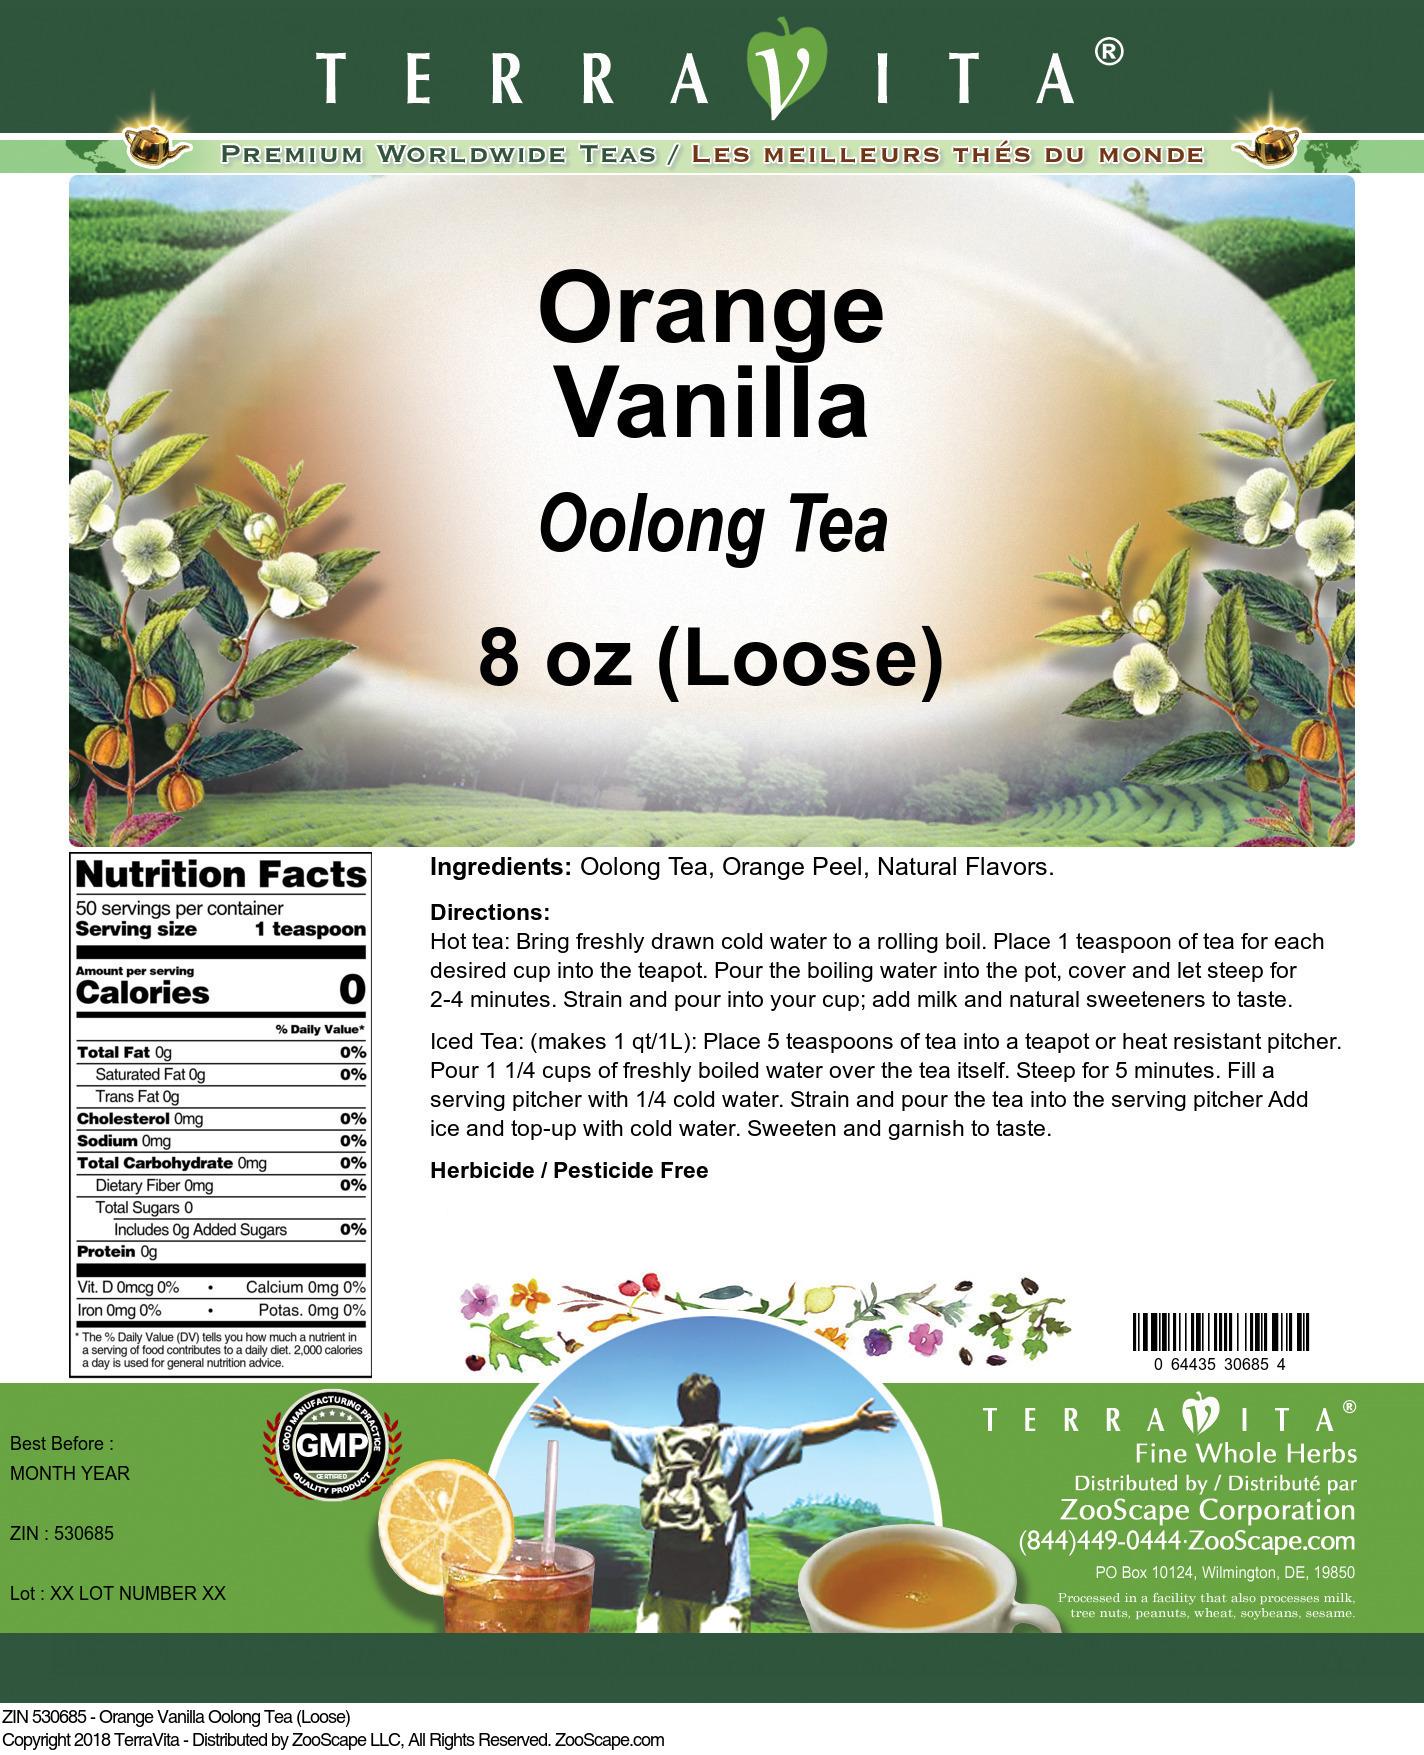 Orange Vanilla Oolong Tea (Loose)